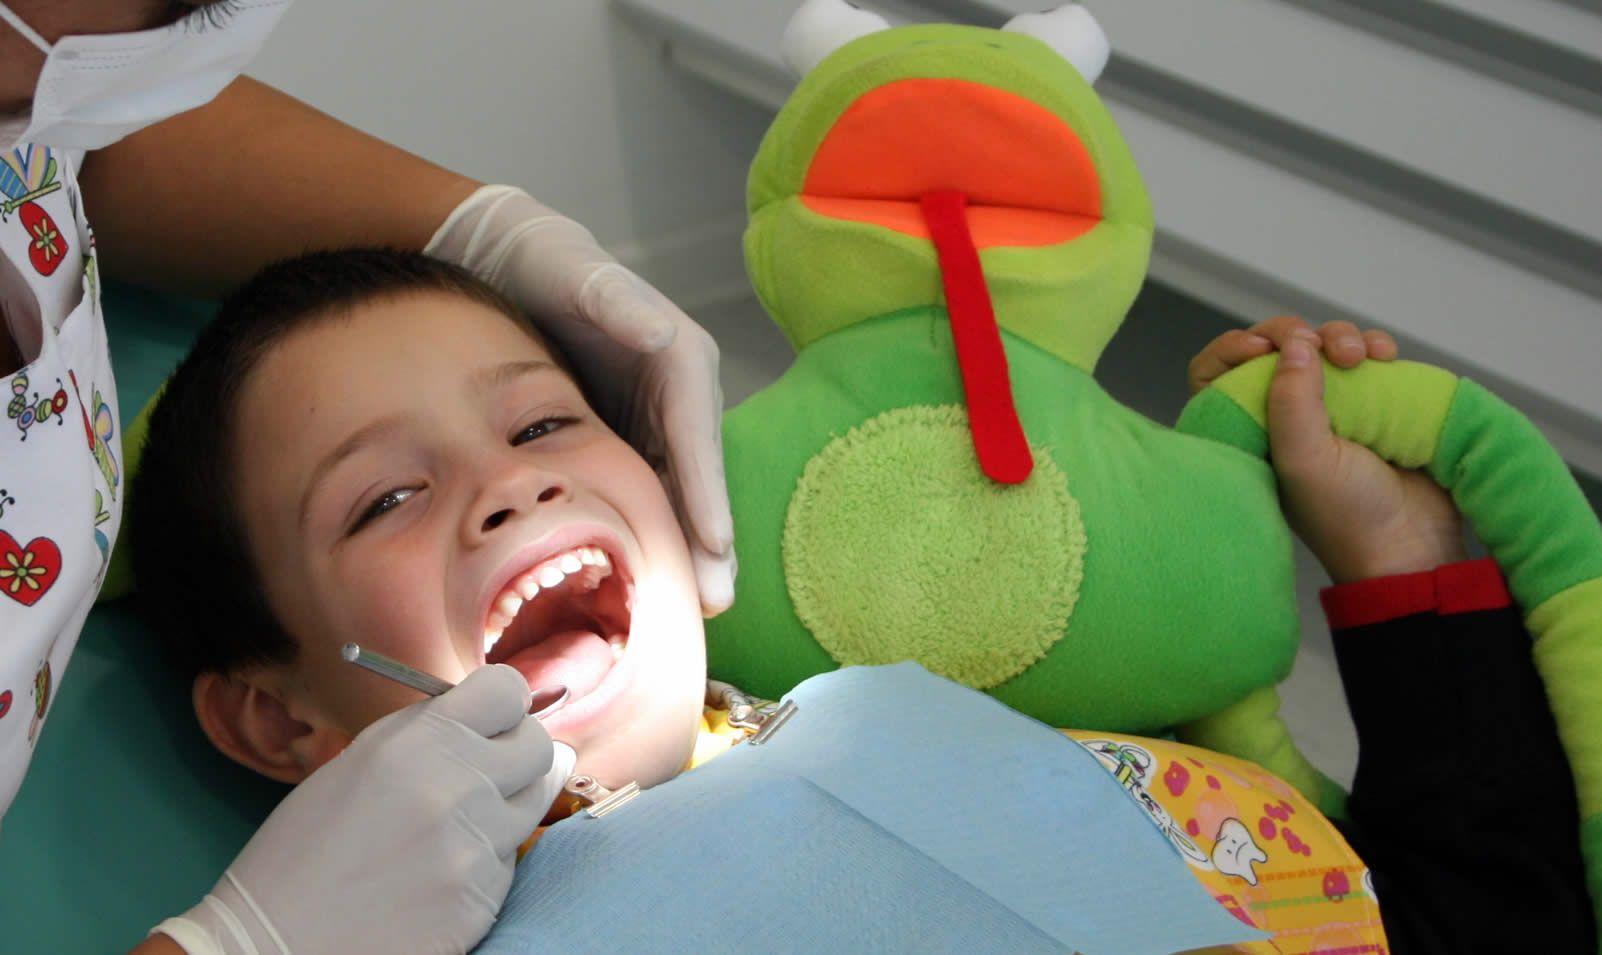 Imagen de http://www.clinicadentalagustinas.cl/wp-content/uploads/2015/06/odontopediatria.jpg.